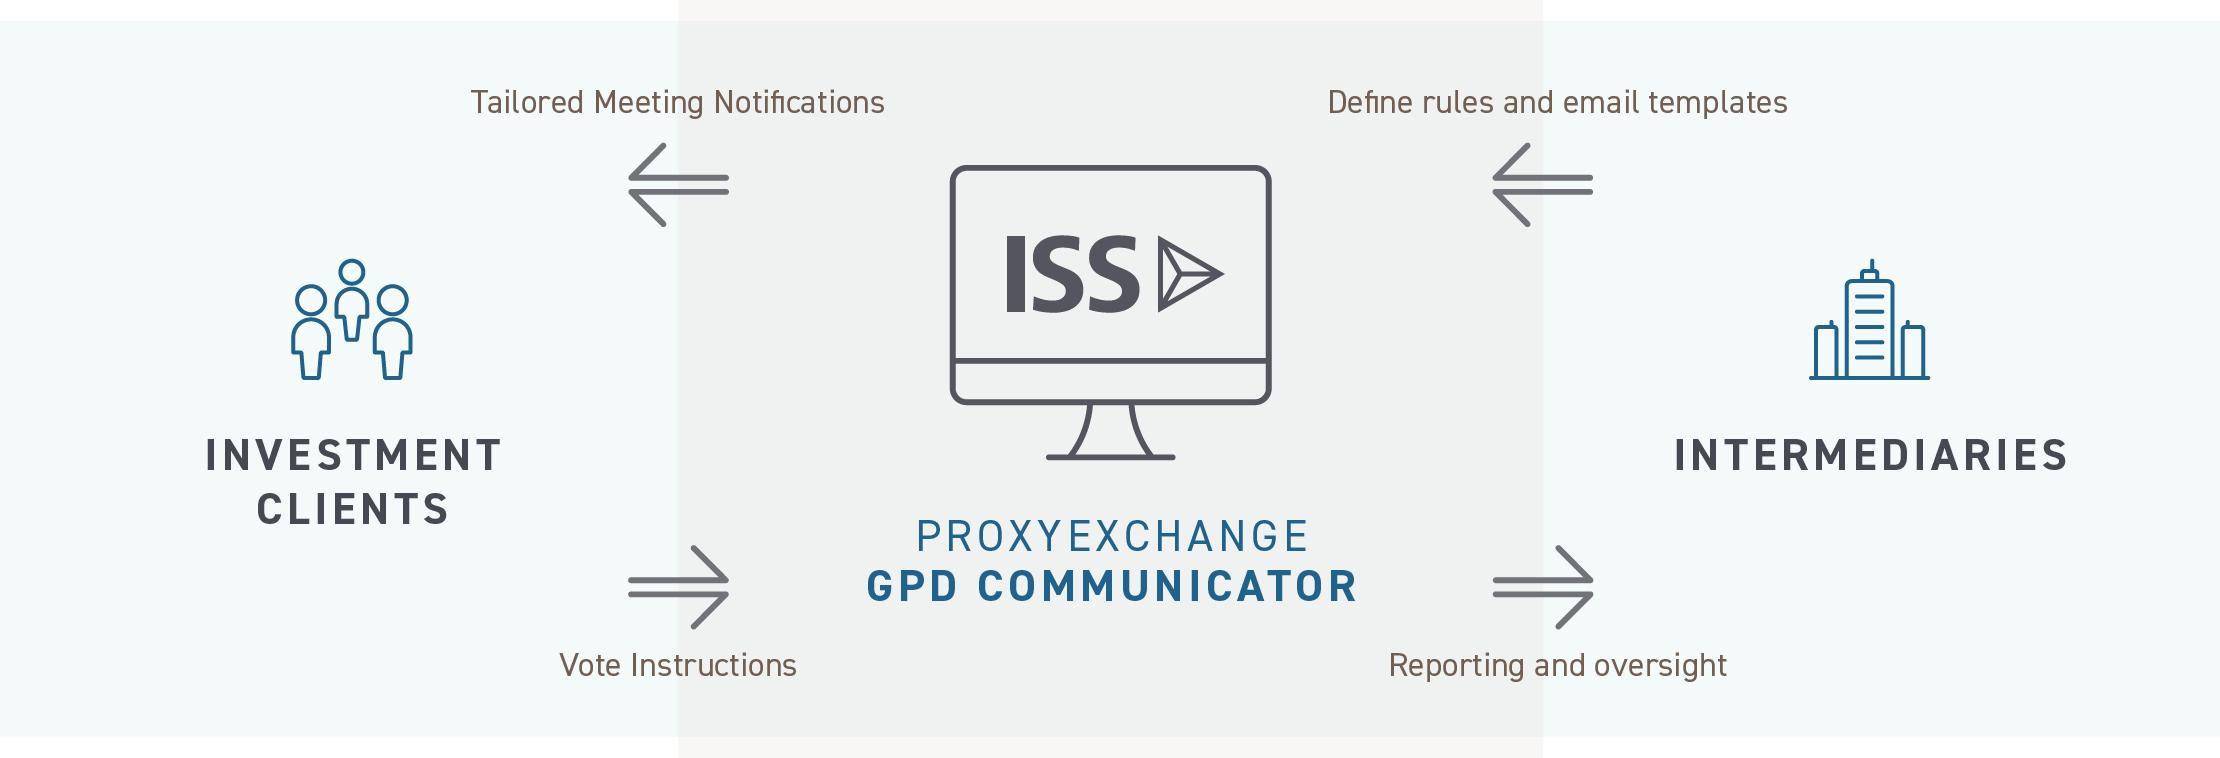 gpd-communicator